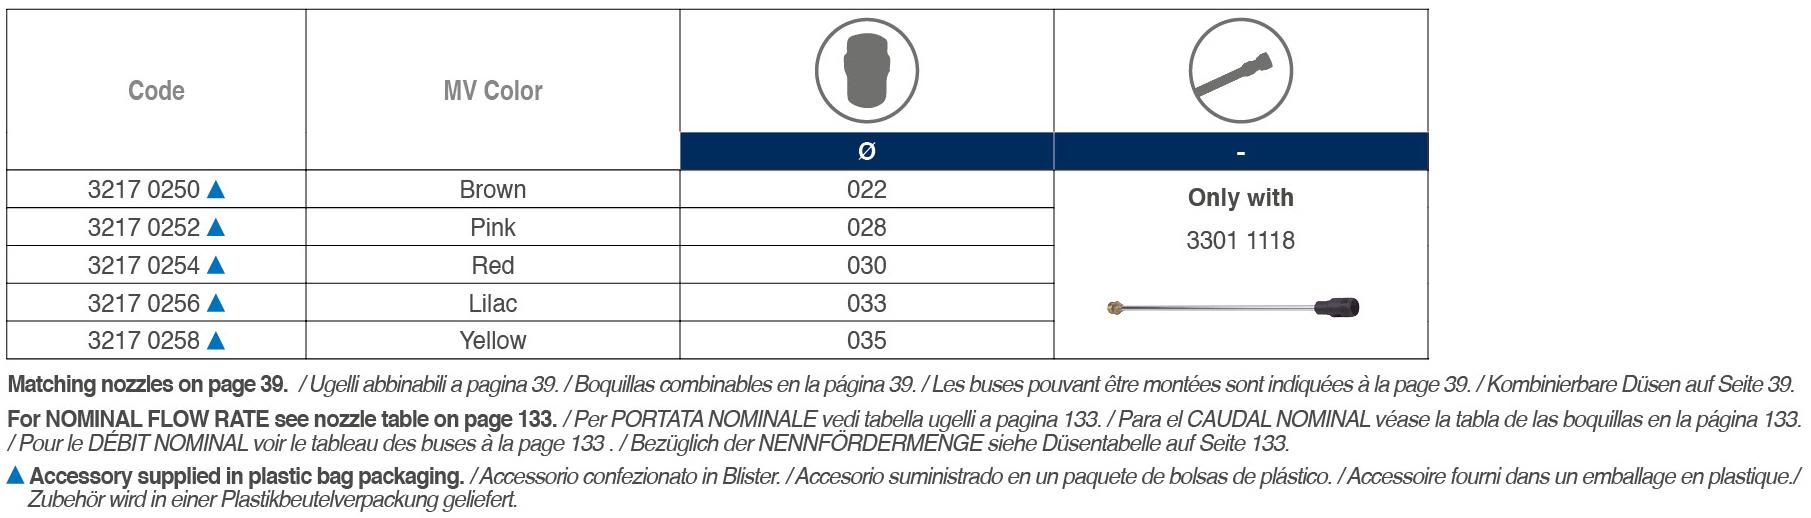 Securfix Adjust Nozzle Head tabelle 02